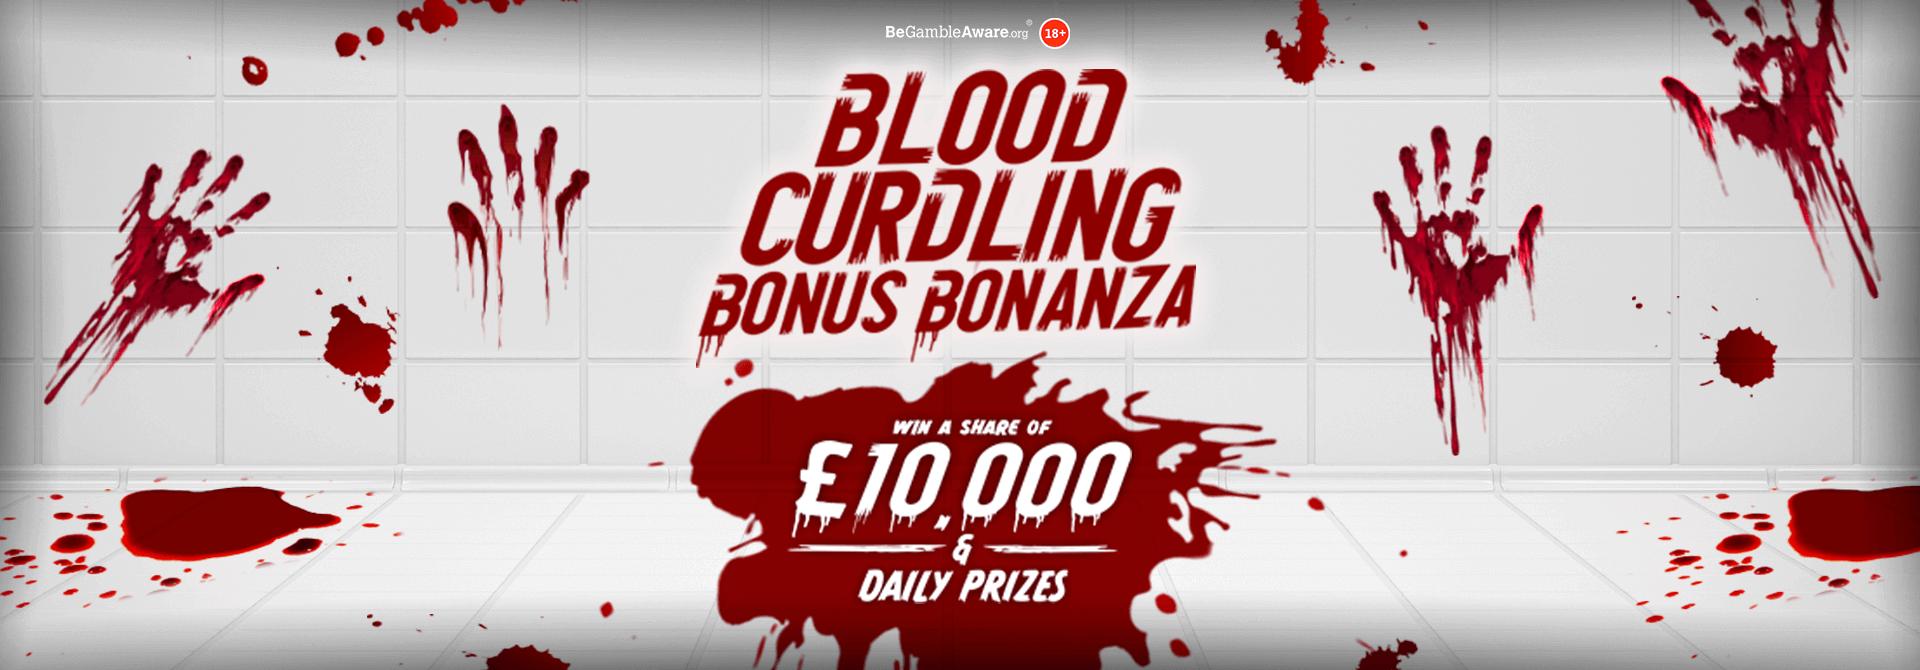 Get ready for PocketWin's Blood Curdling Bonus Bonanza this Halloween!